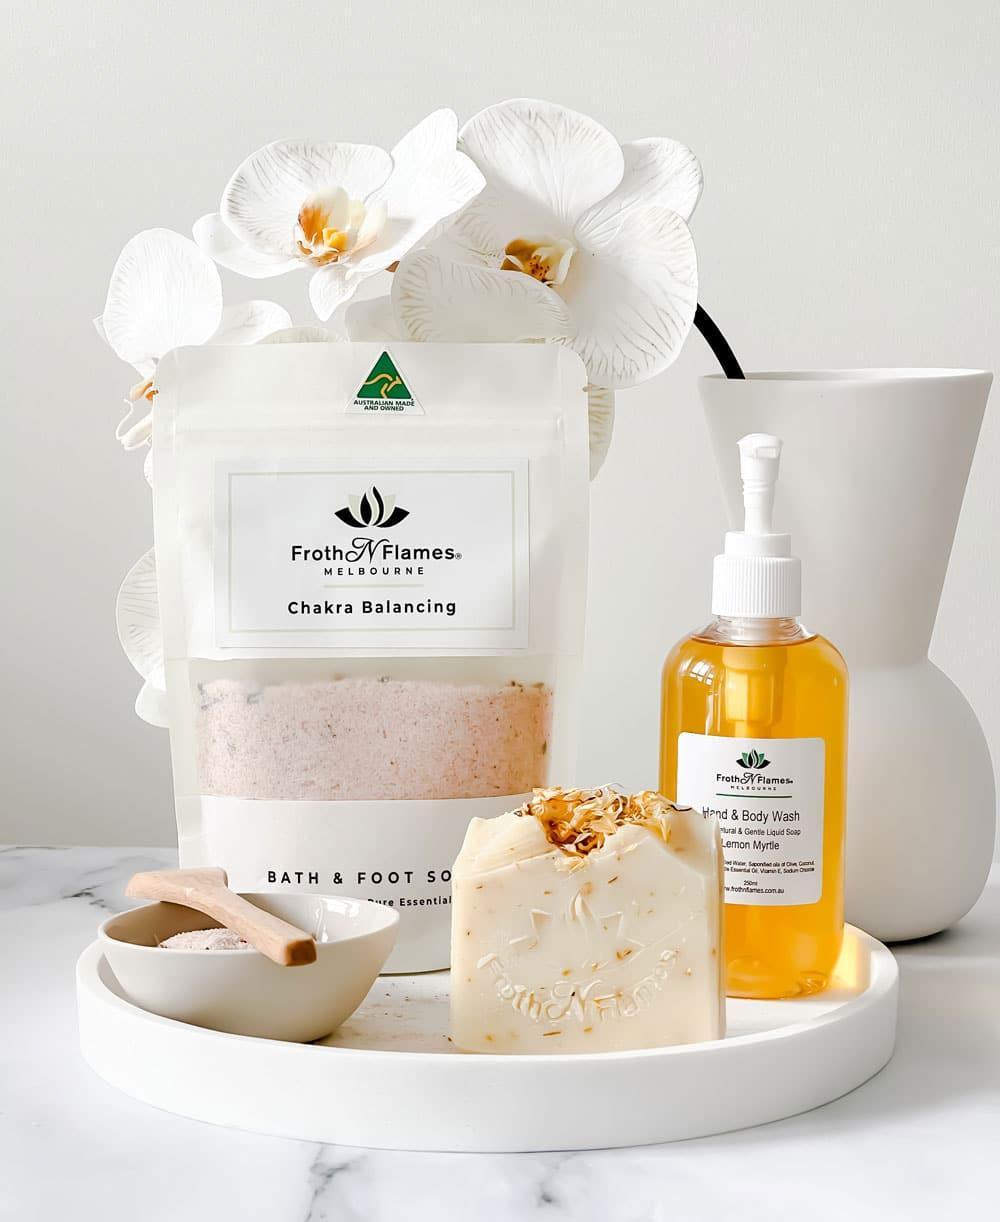 Handmade bath products